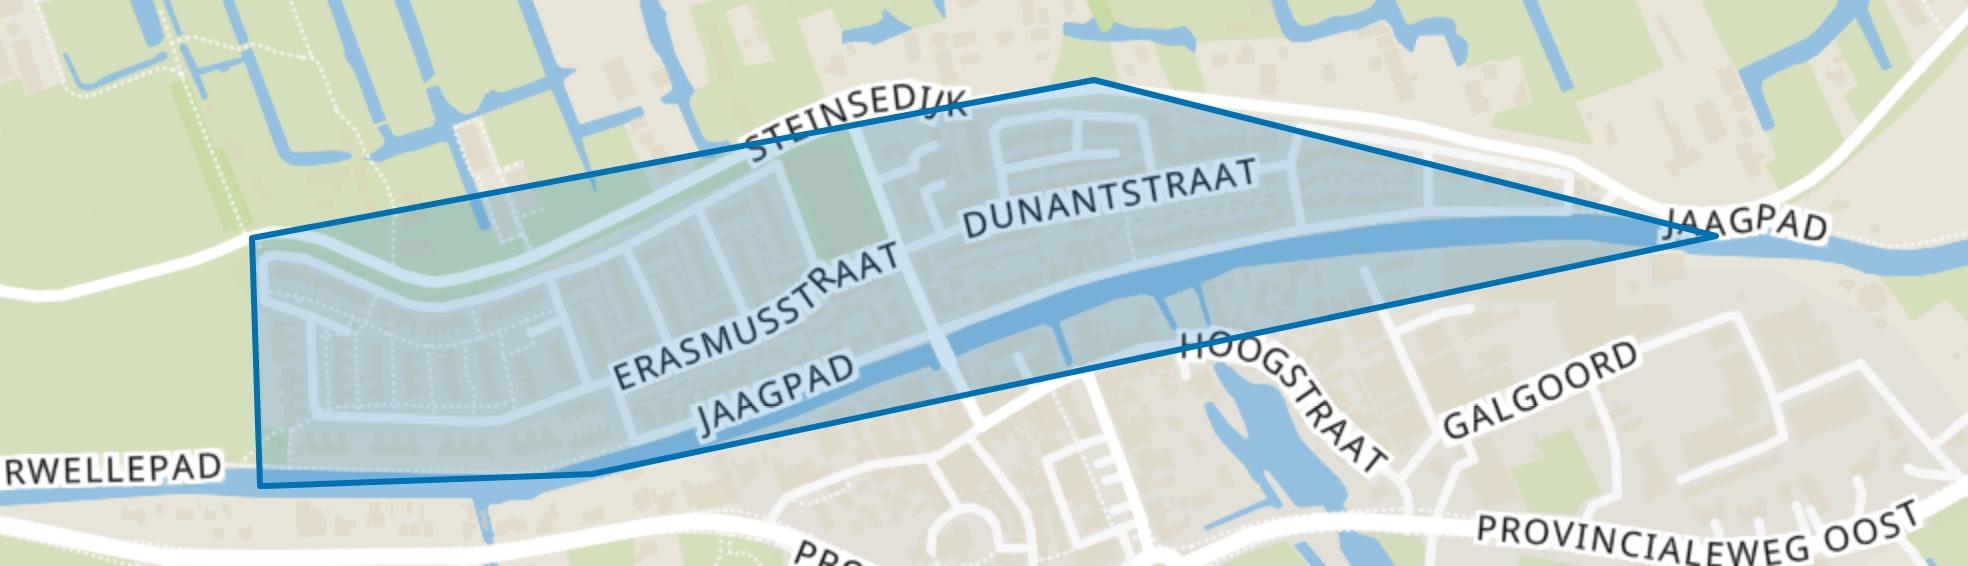 Stein, Haastrecht map